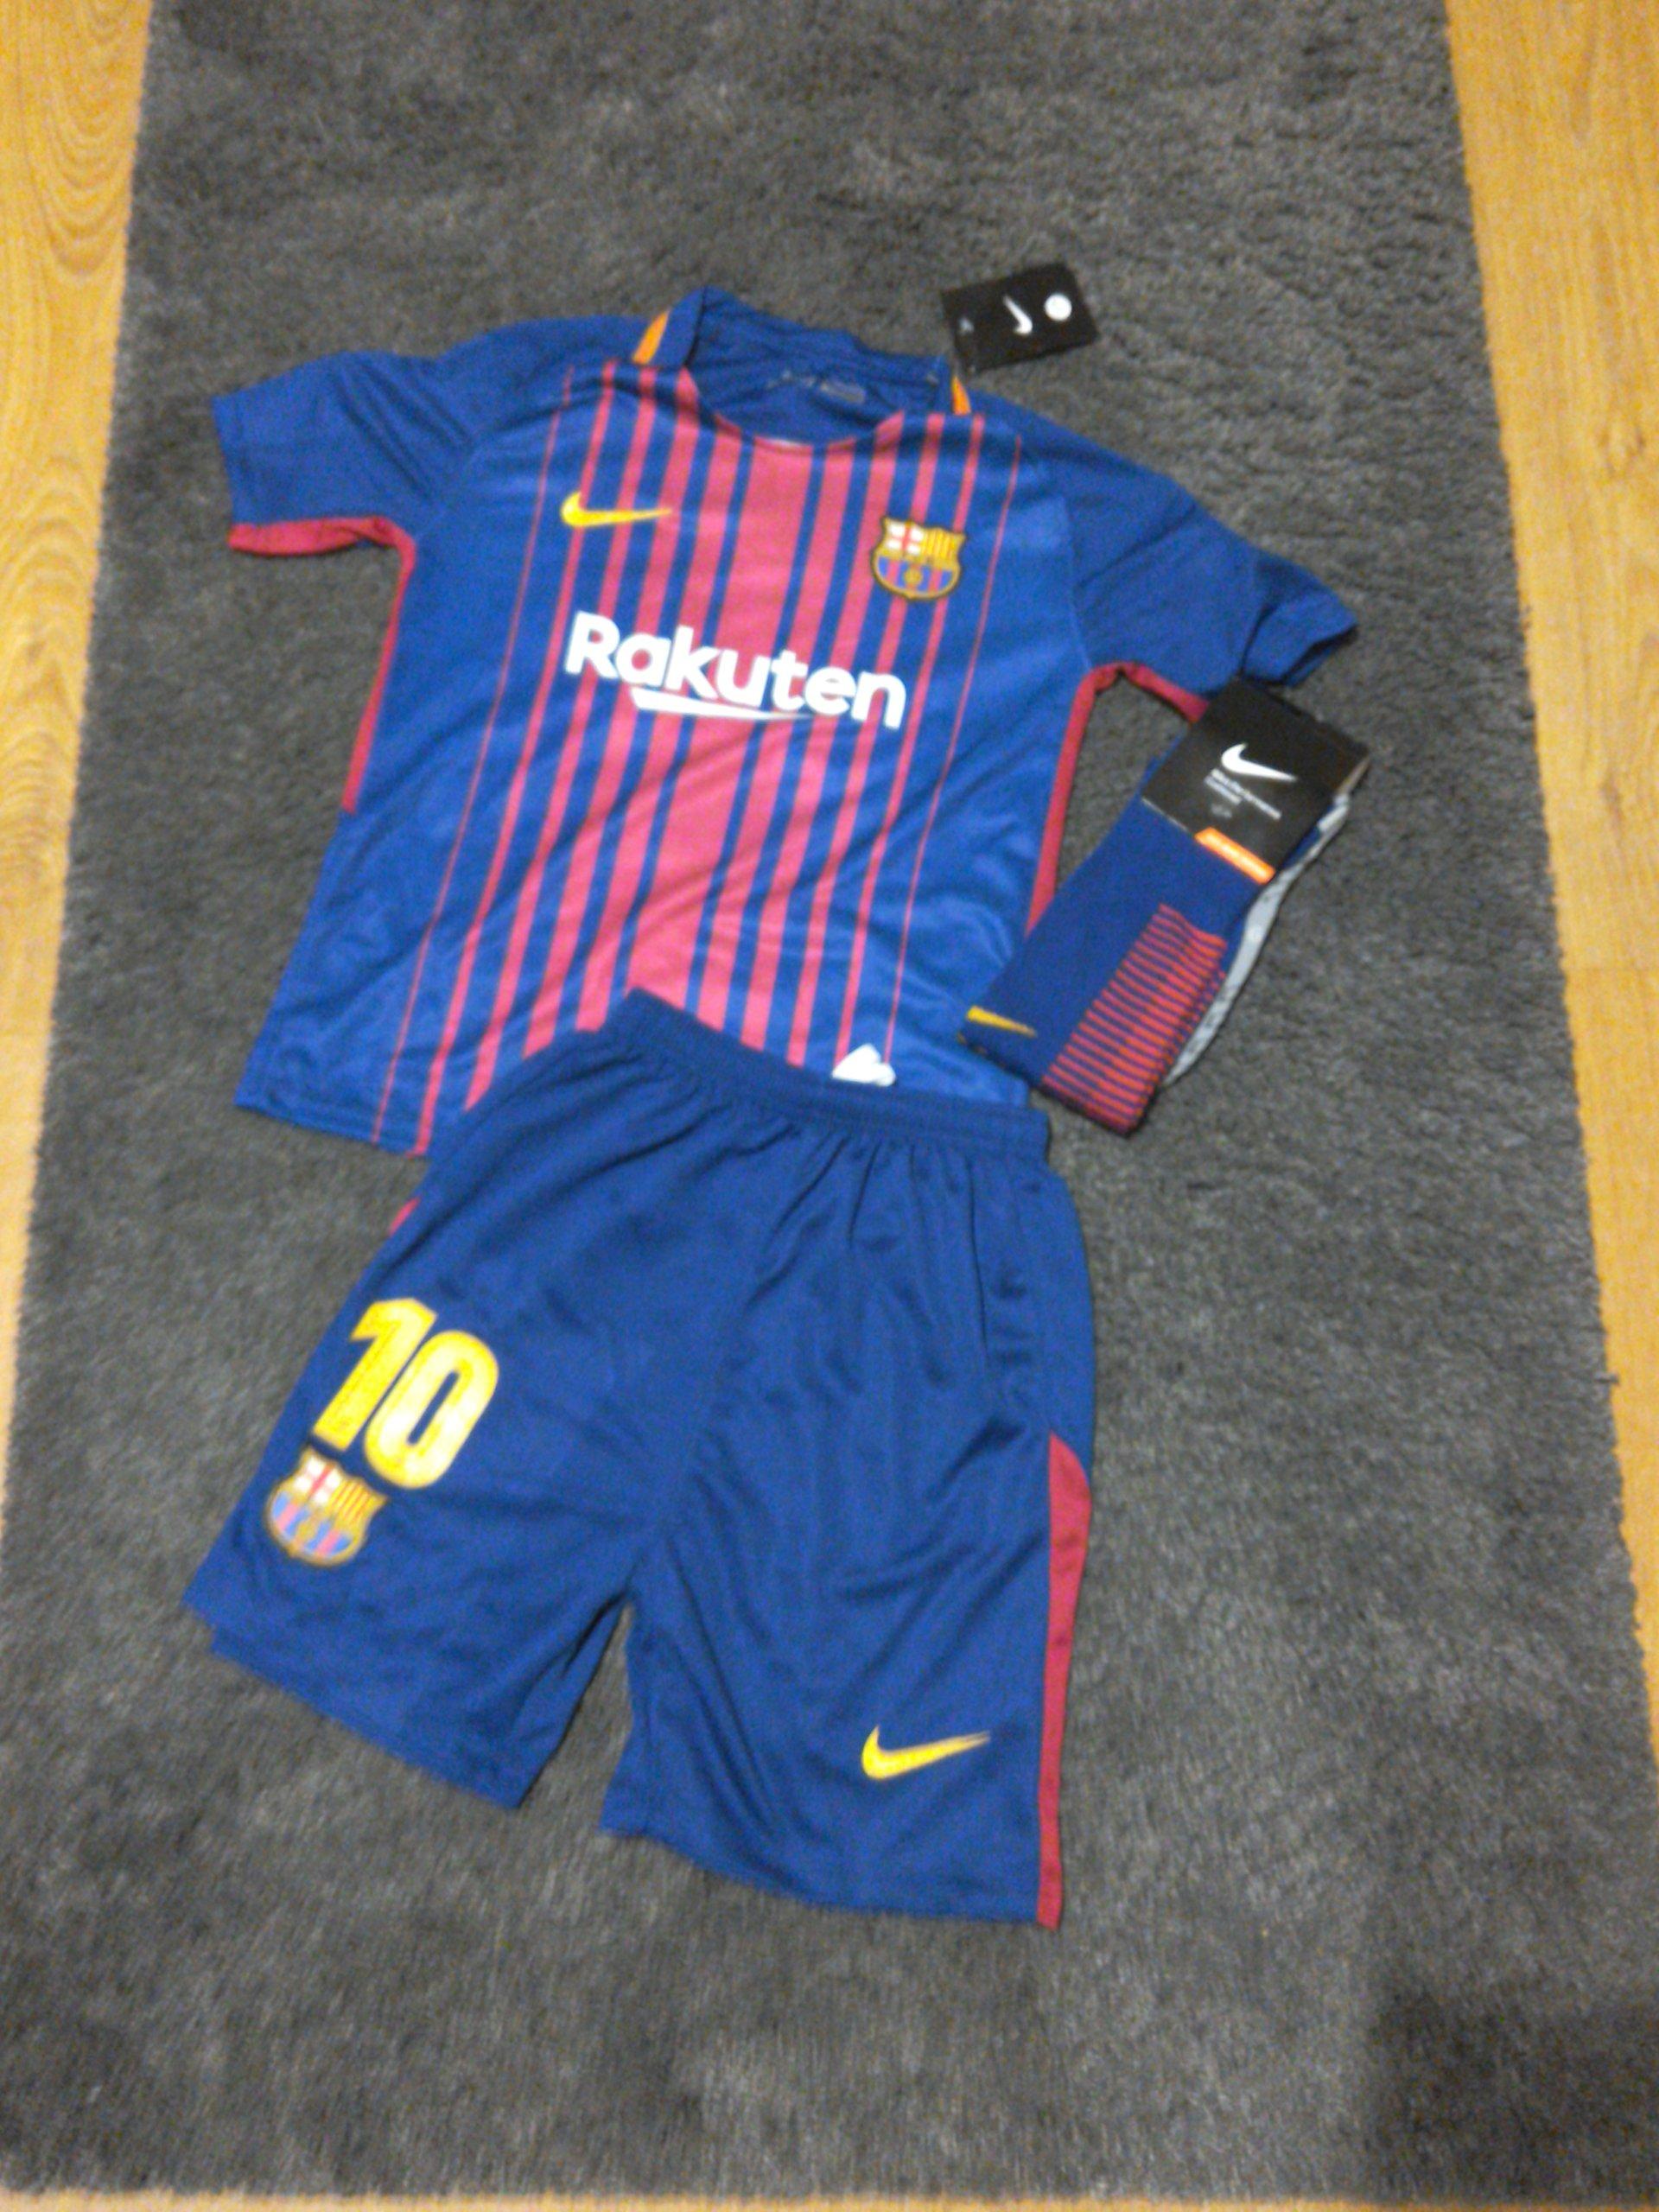 a1d126a34 Strój piłkarski Fc Barcelona Messi 17/18 roz.24 - 7194210907 ...